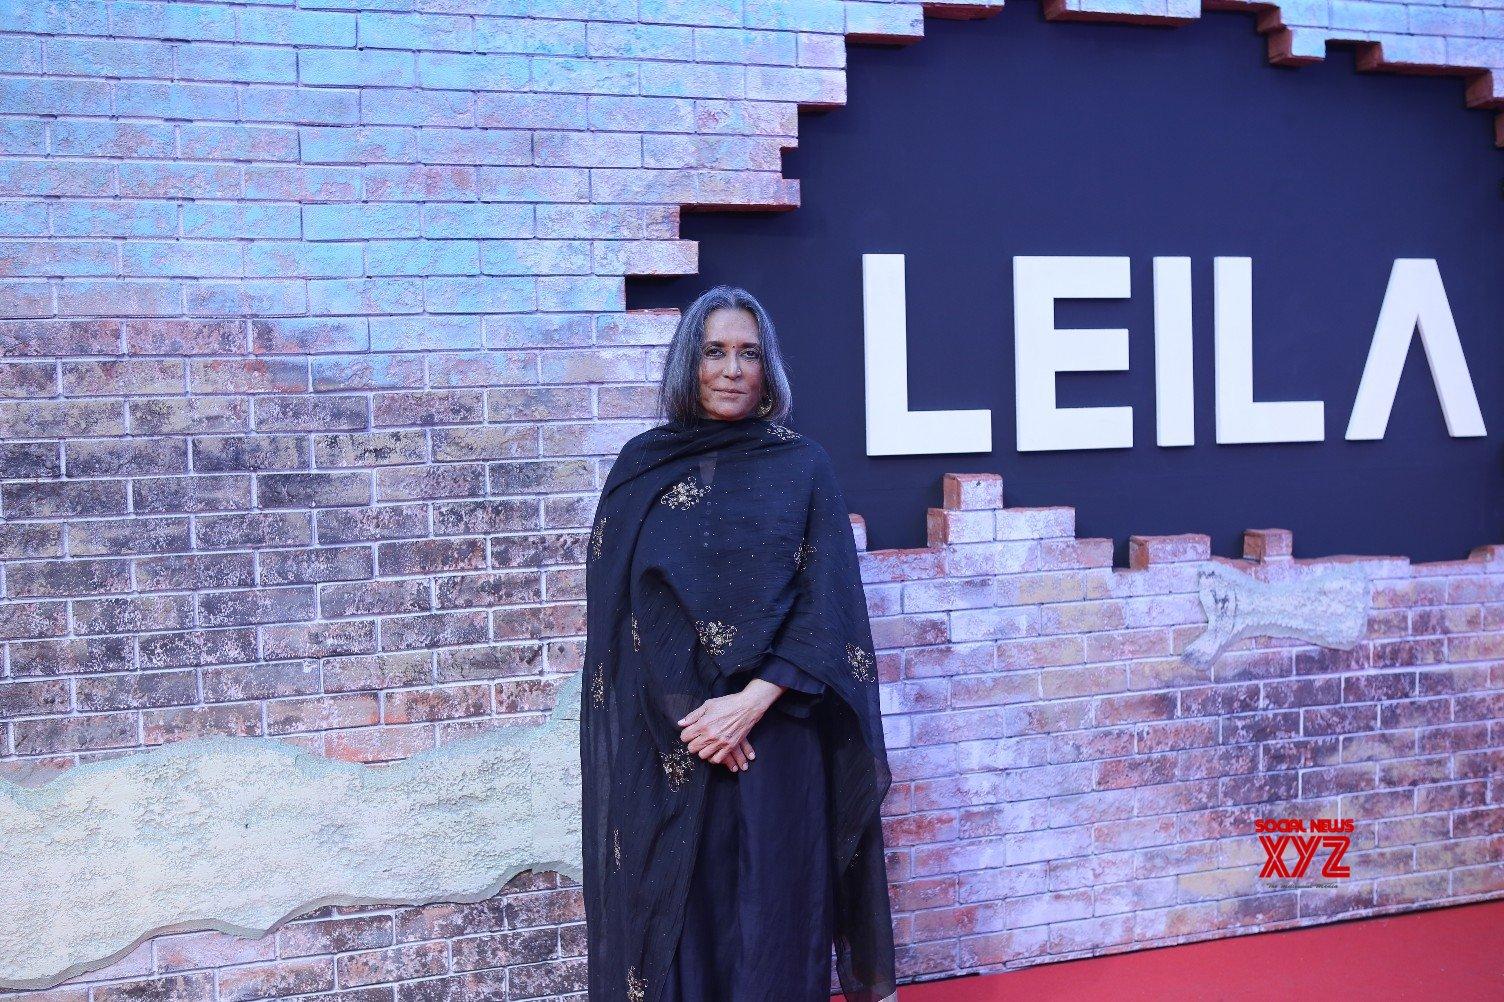 Reality is cautionary, not scary: Deepa Mehta